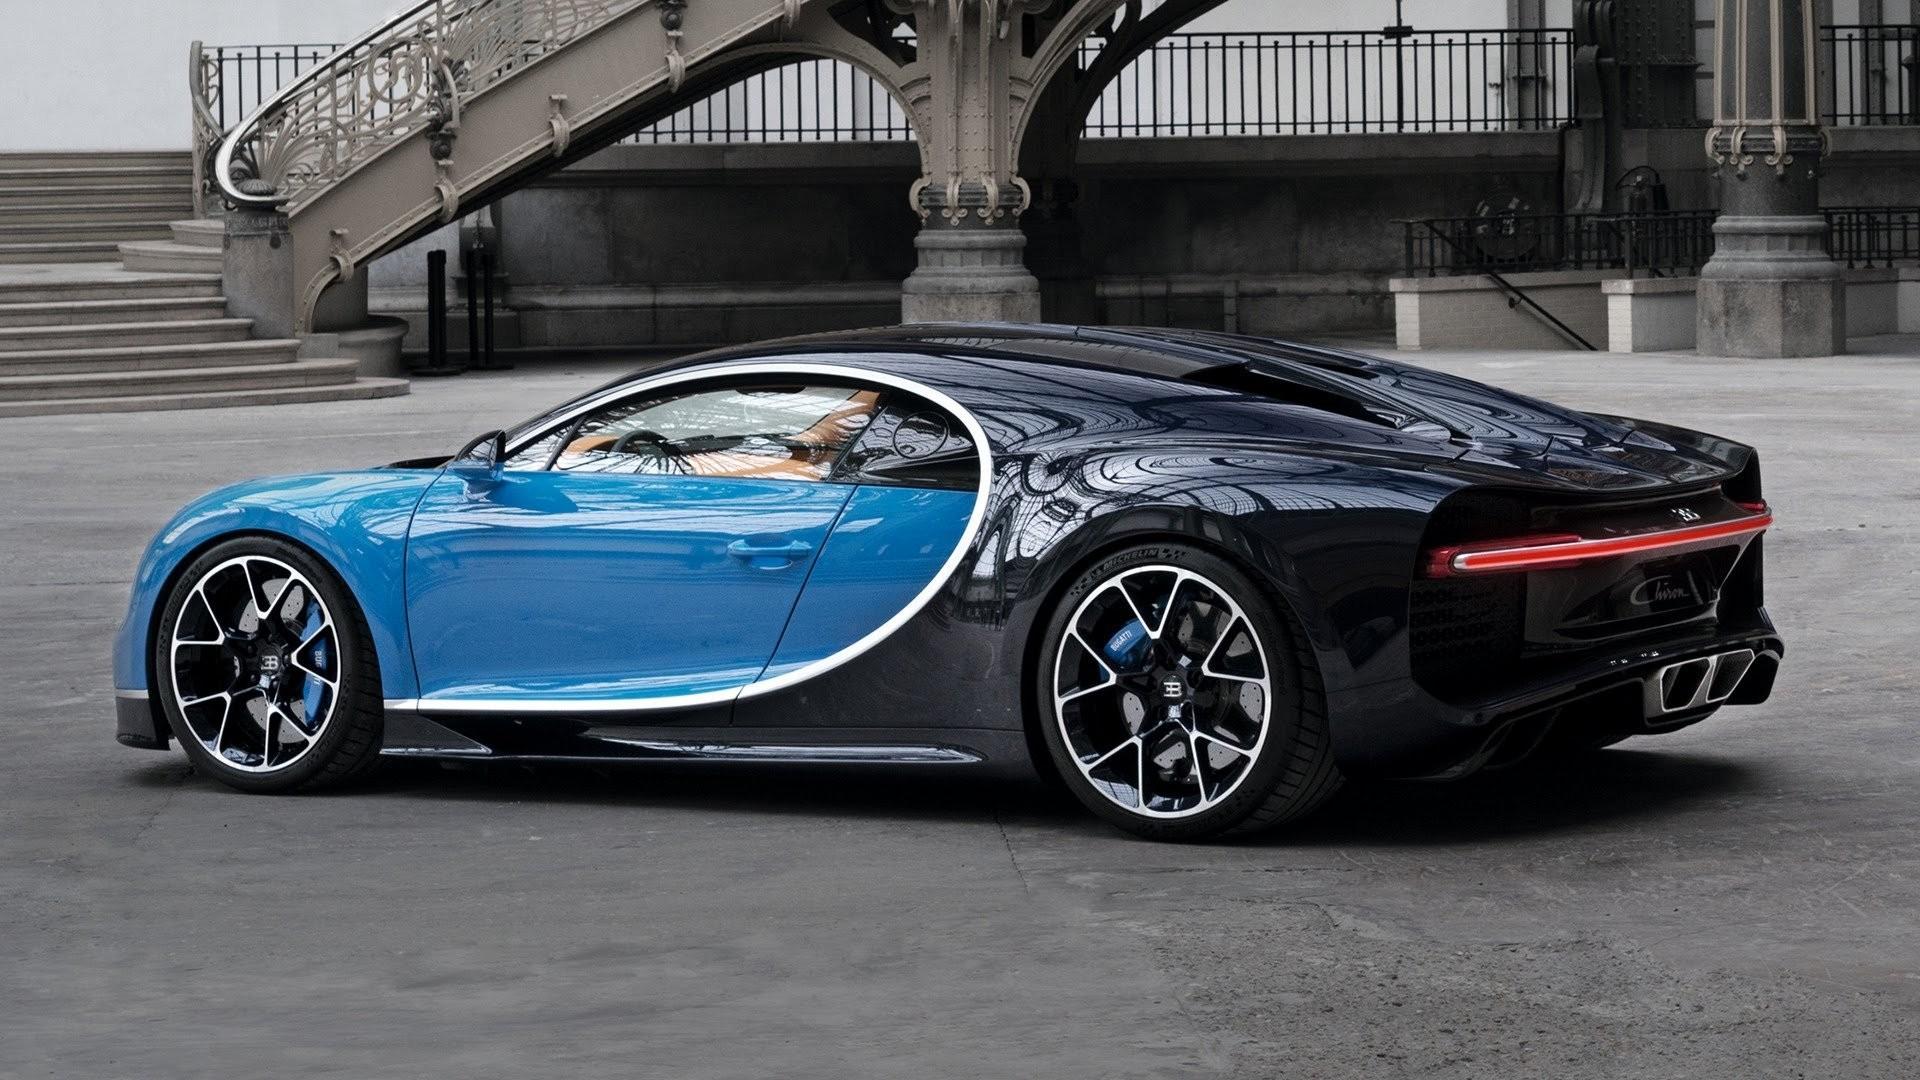 Bugatti Chiron Download Free Wallpaper Image Search